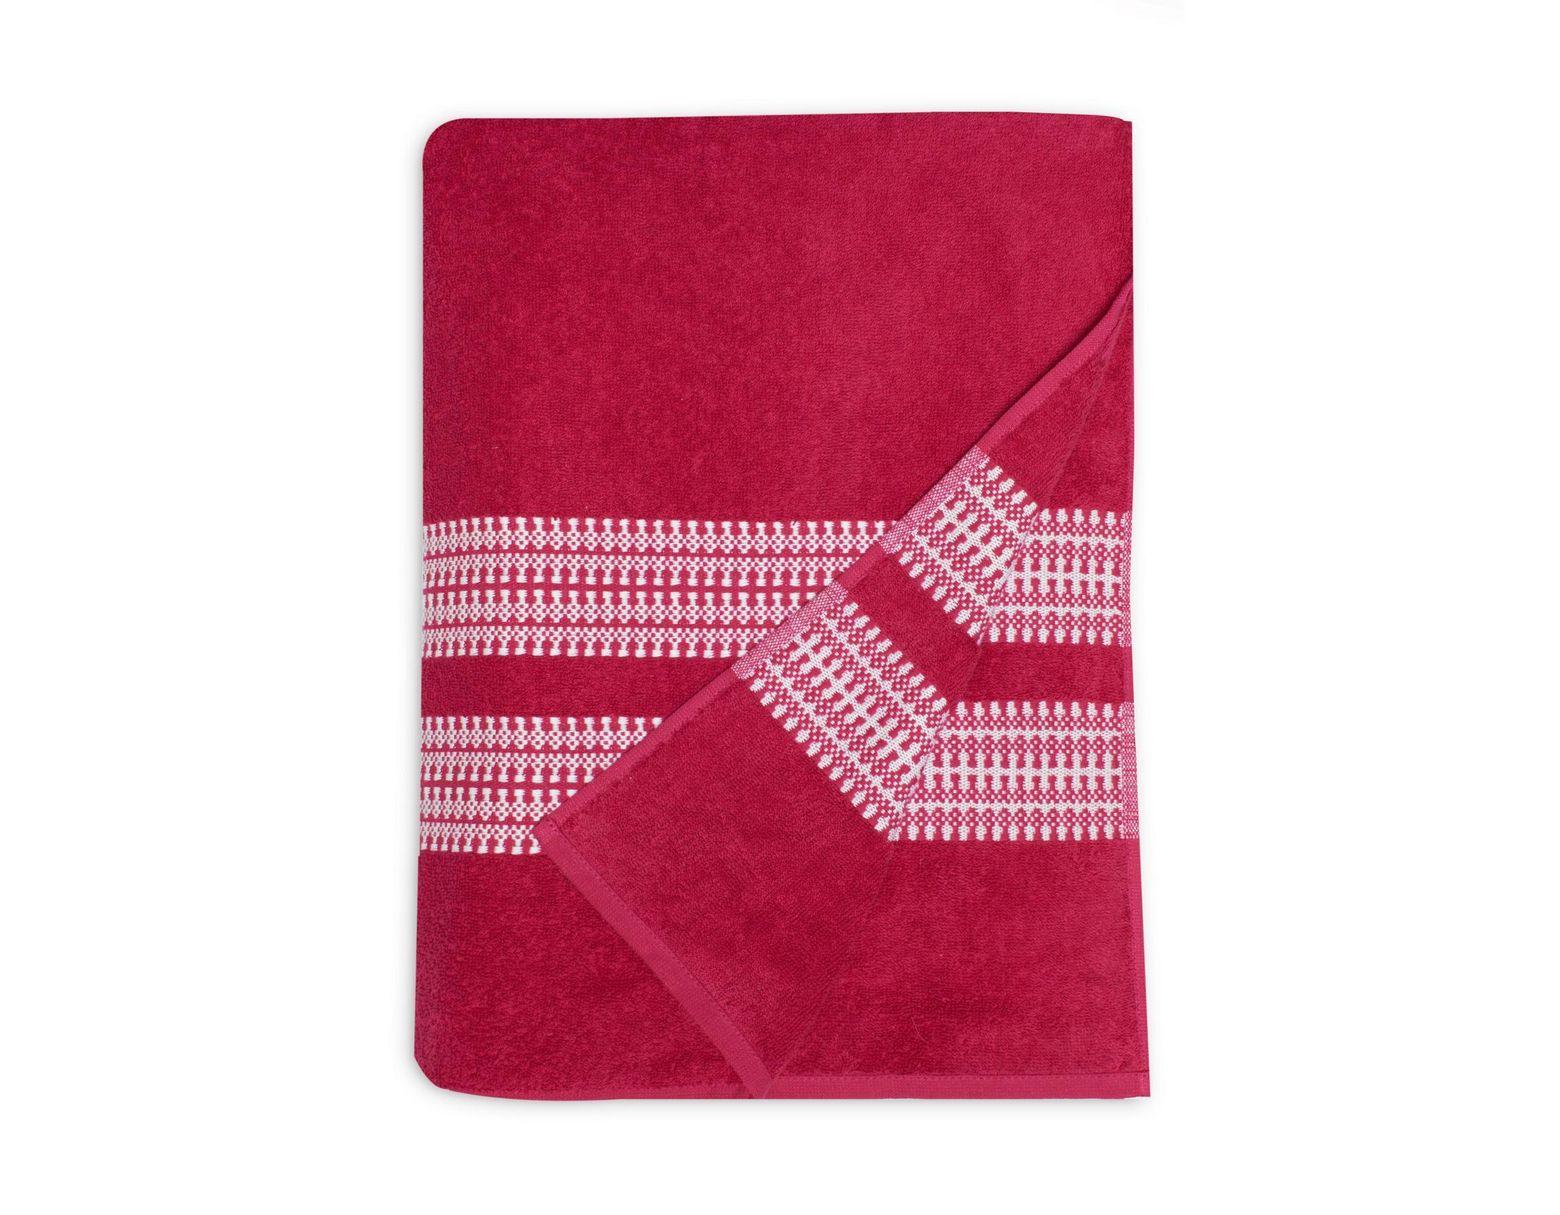 Ugg Bay Stripe Beach Towel In Red Lyst